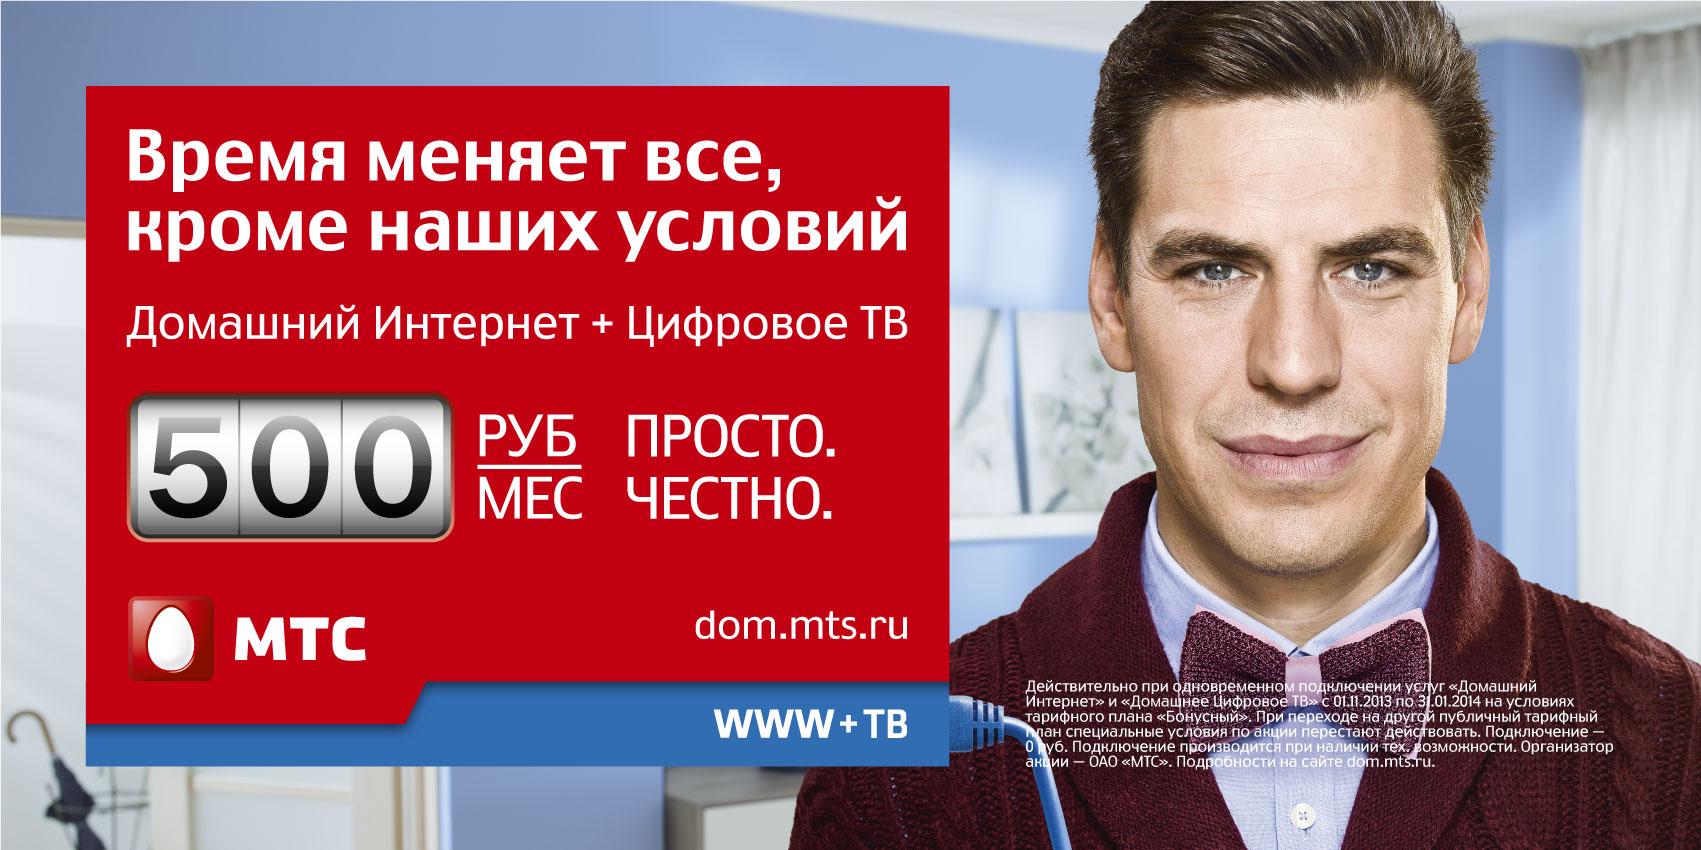 Мтс интернет помощник - 1e